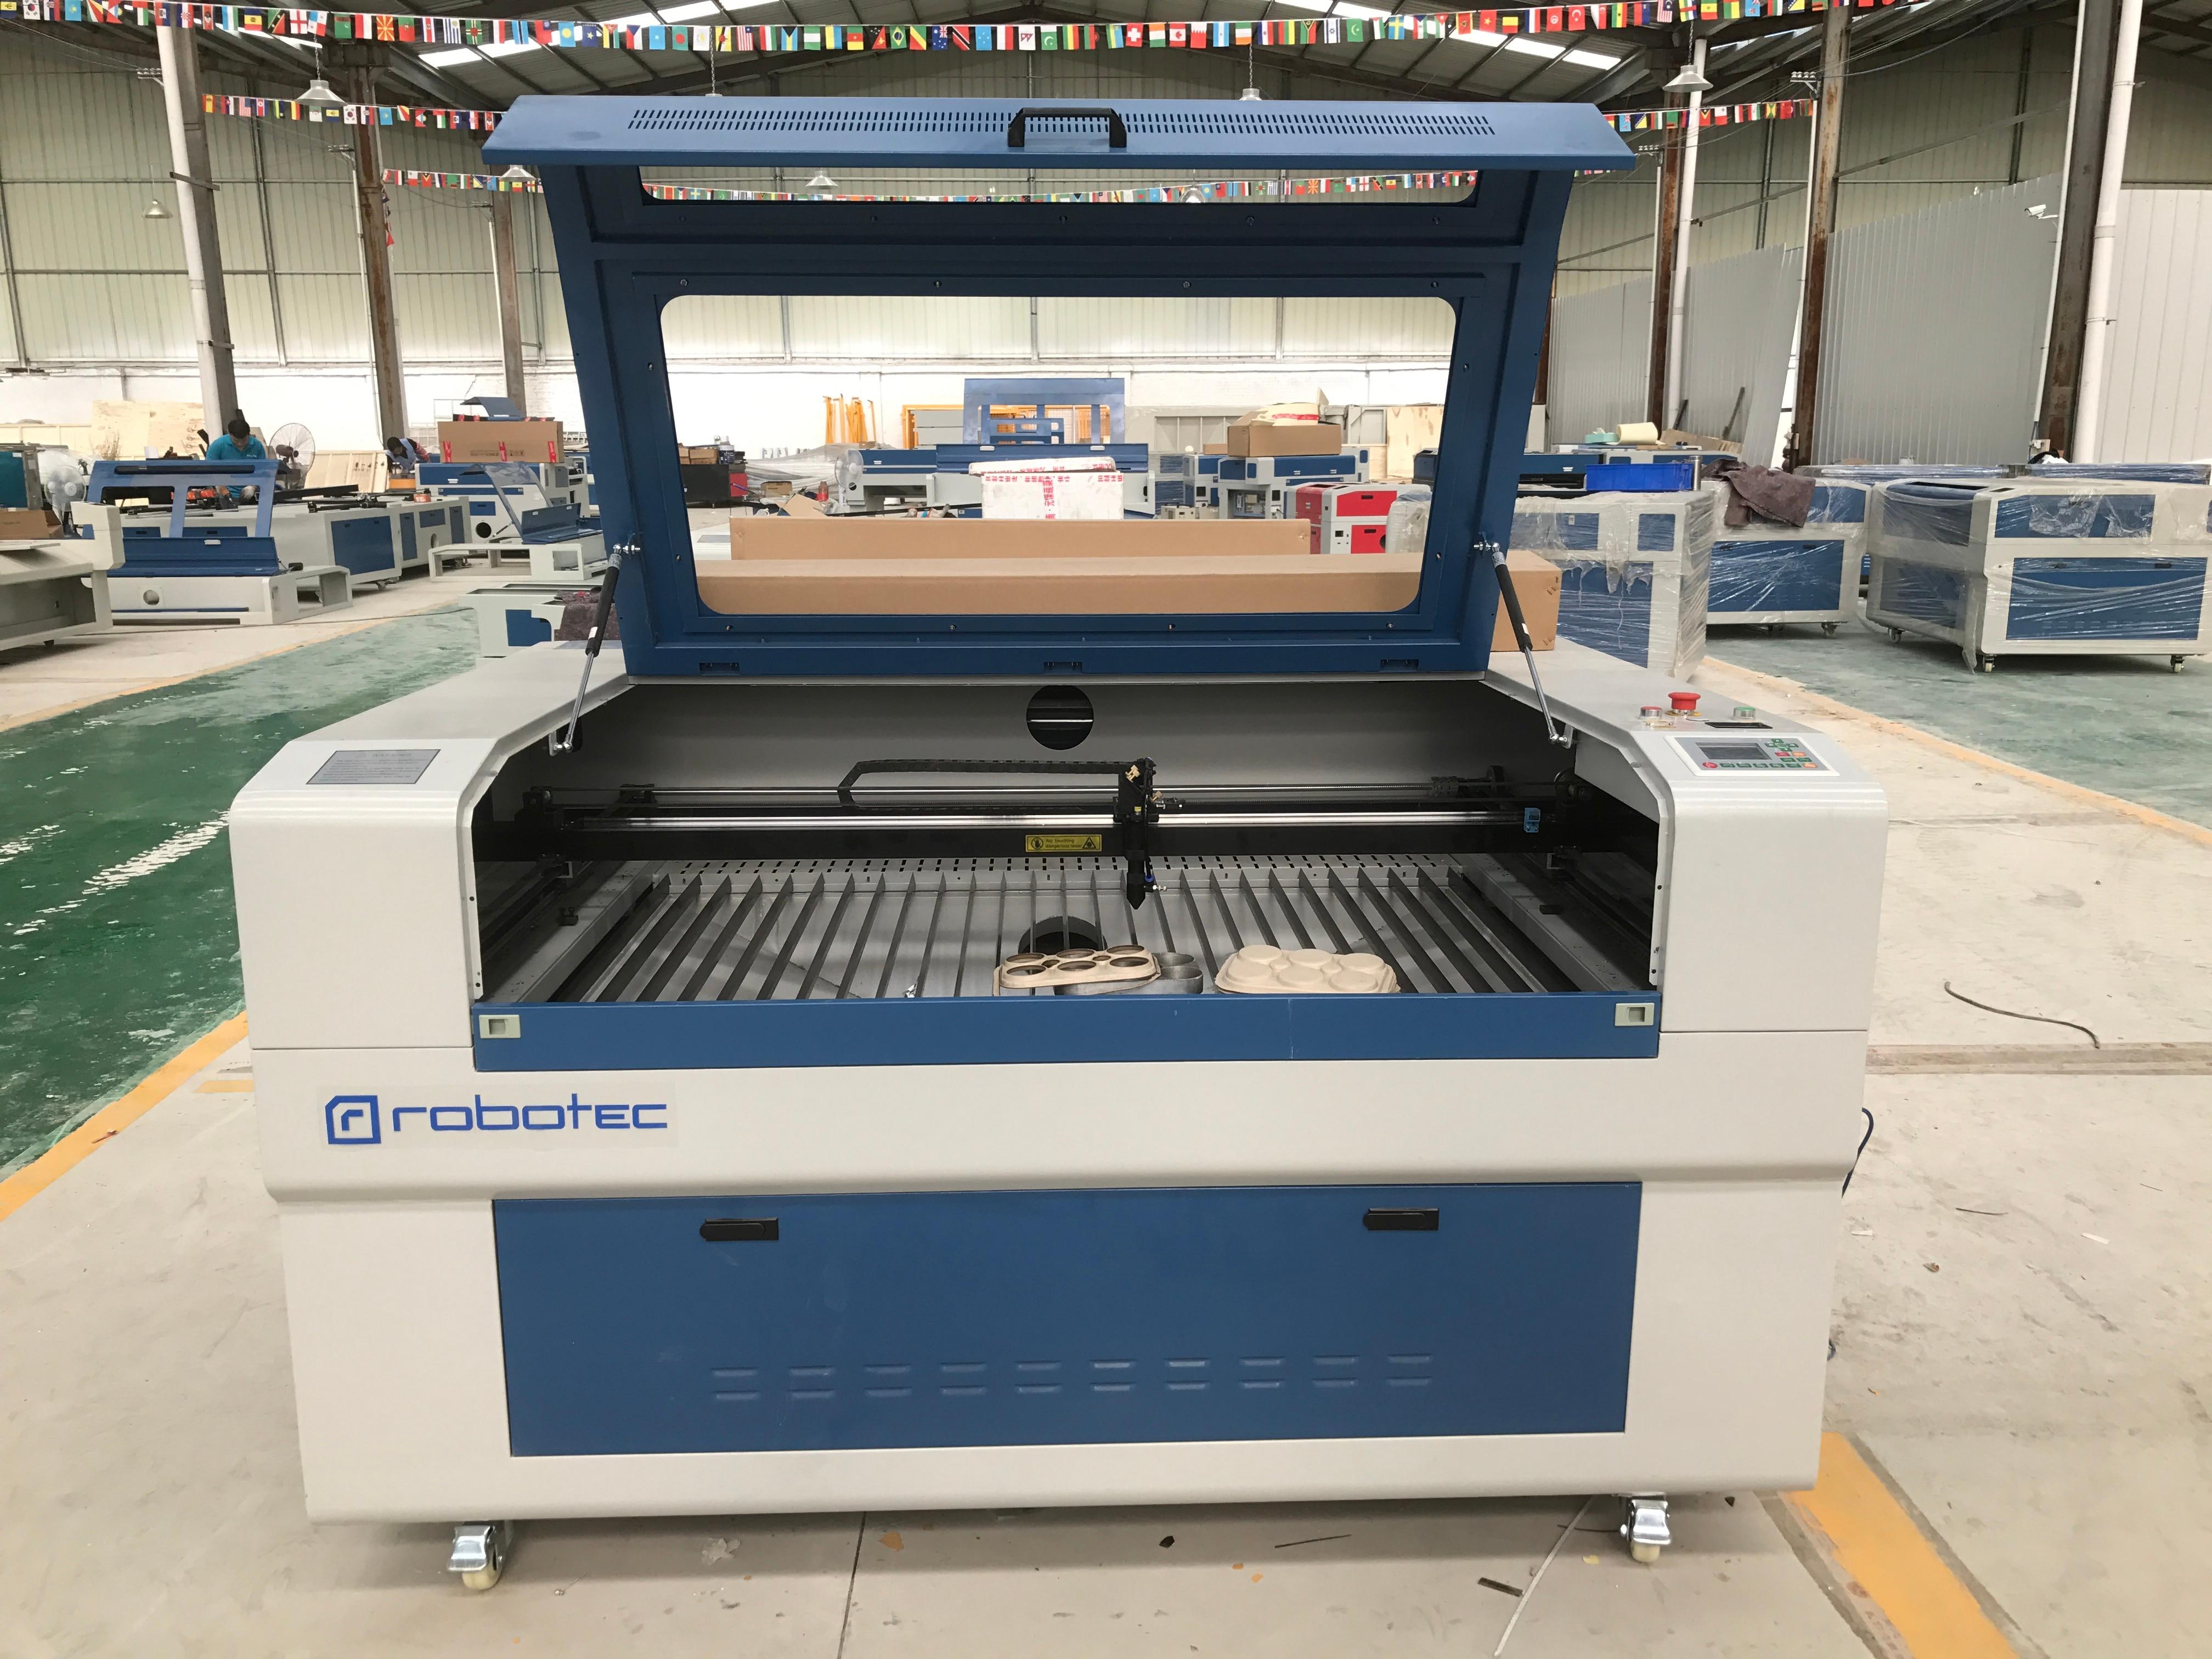 Reci 80W 130W Wood MDF Acrylic Paint Metal Stone Co2 Laser Cutter Machine / Laser Engraving Machine 1390/ Laser Cutting Machine